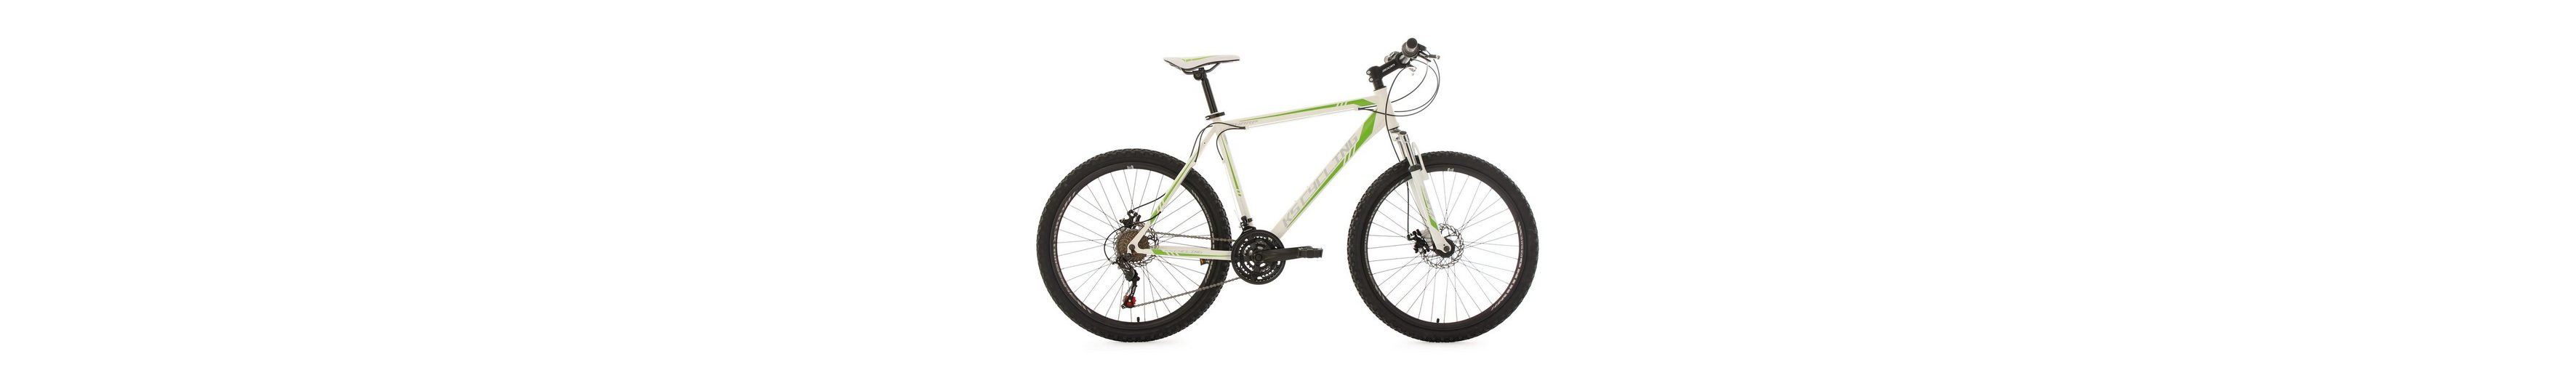 KS Cycling Hardtail-Mountainbike, 26 Zoll, 21 Gang-ShimanoTourney Kettenschaltung, »Sharp«